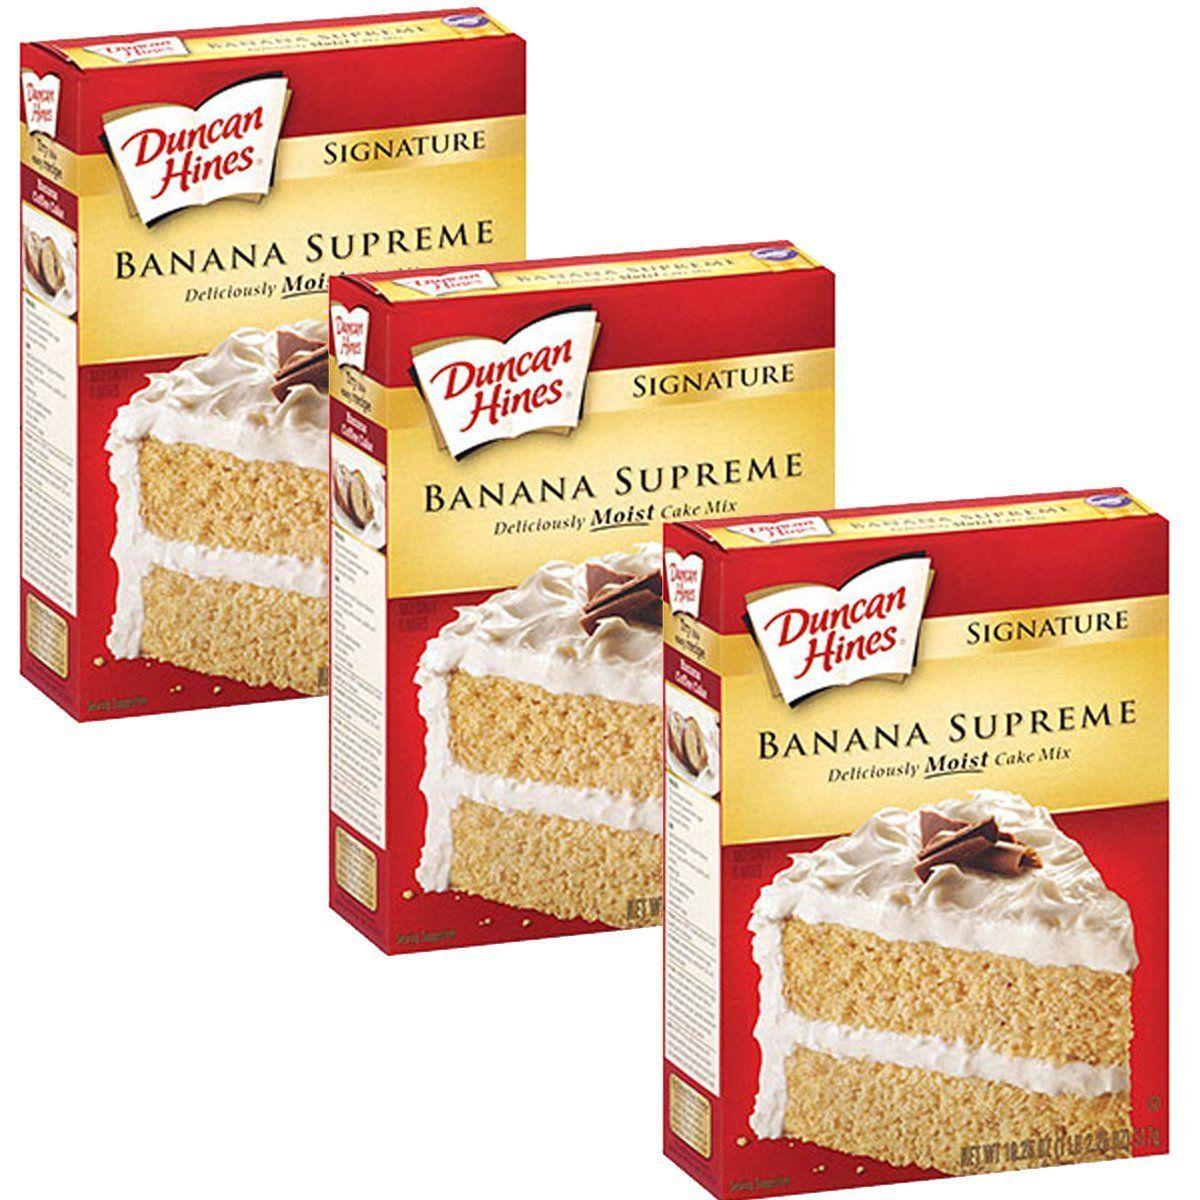 Duncan hines signature cake mix banana supreme 165oz